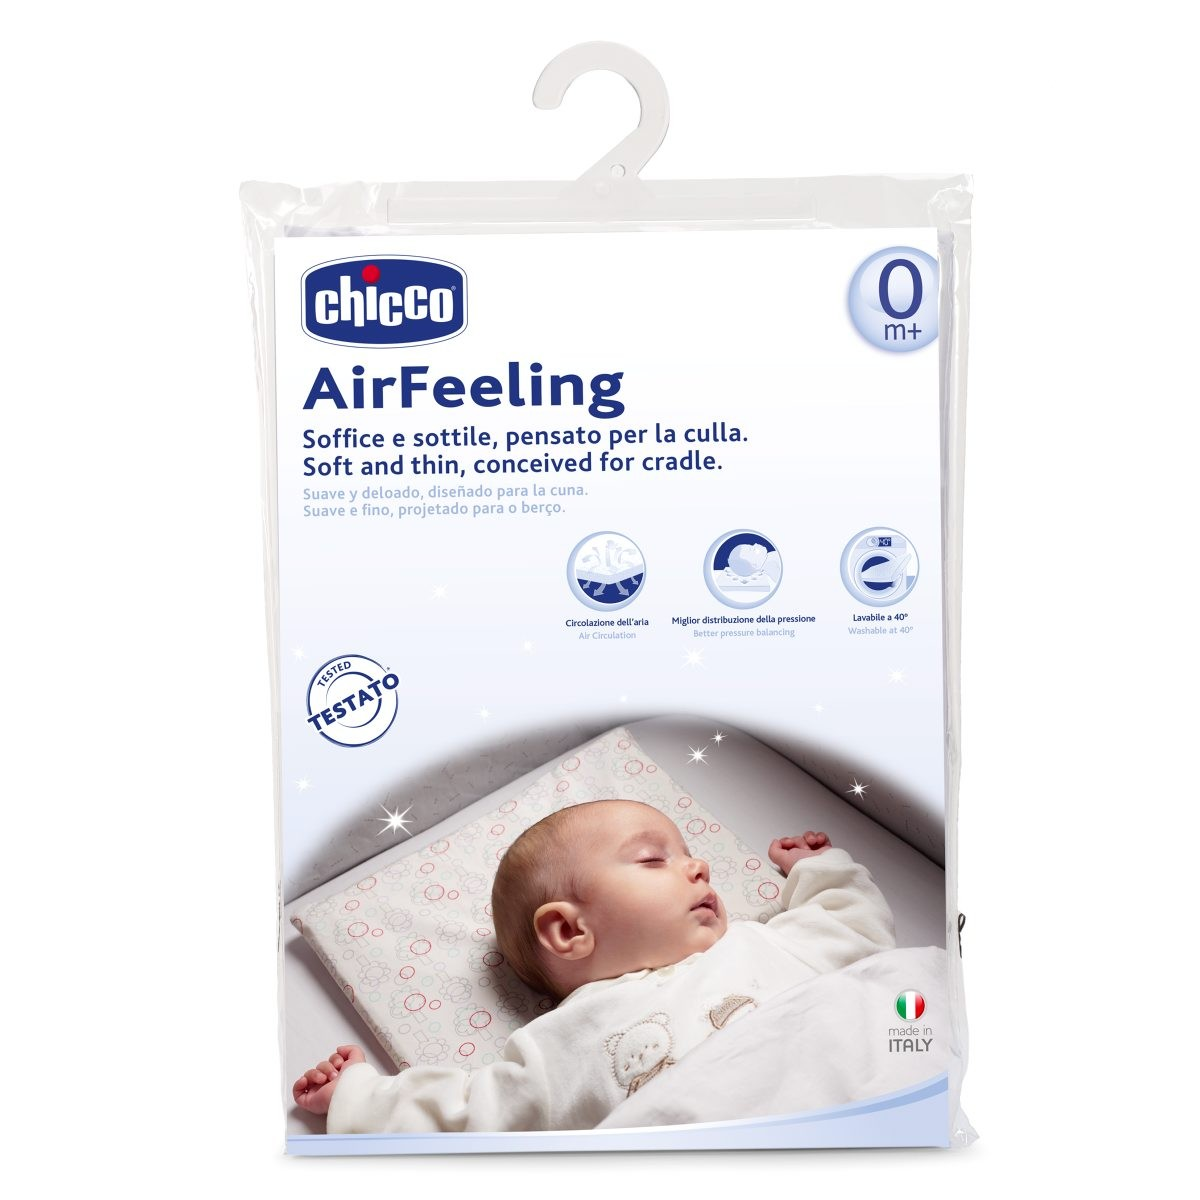 Image of Air Feeling Cuscino Per Culla Chicco®